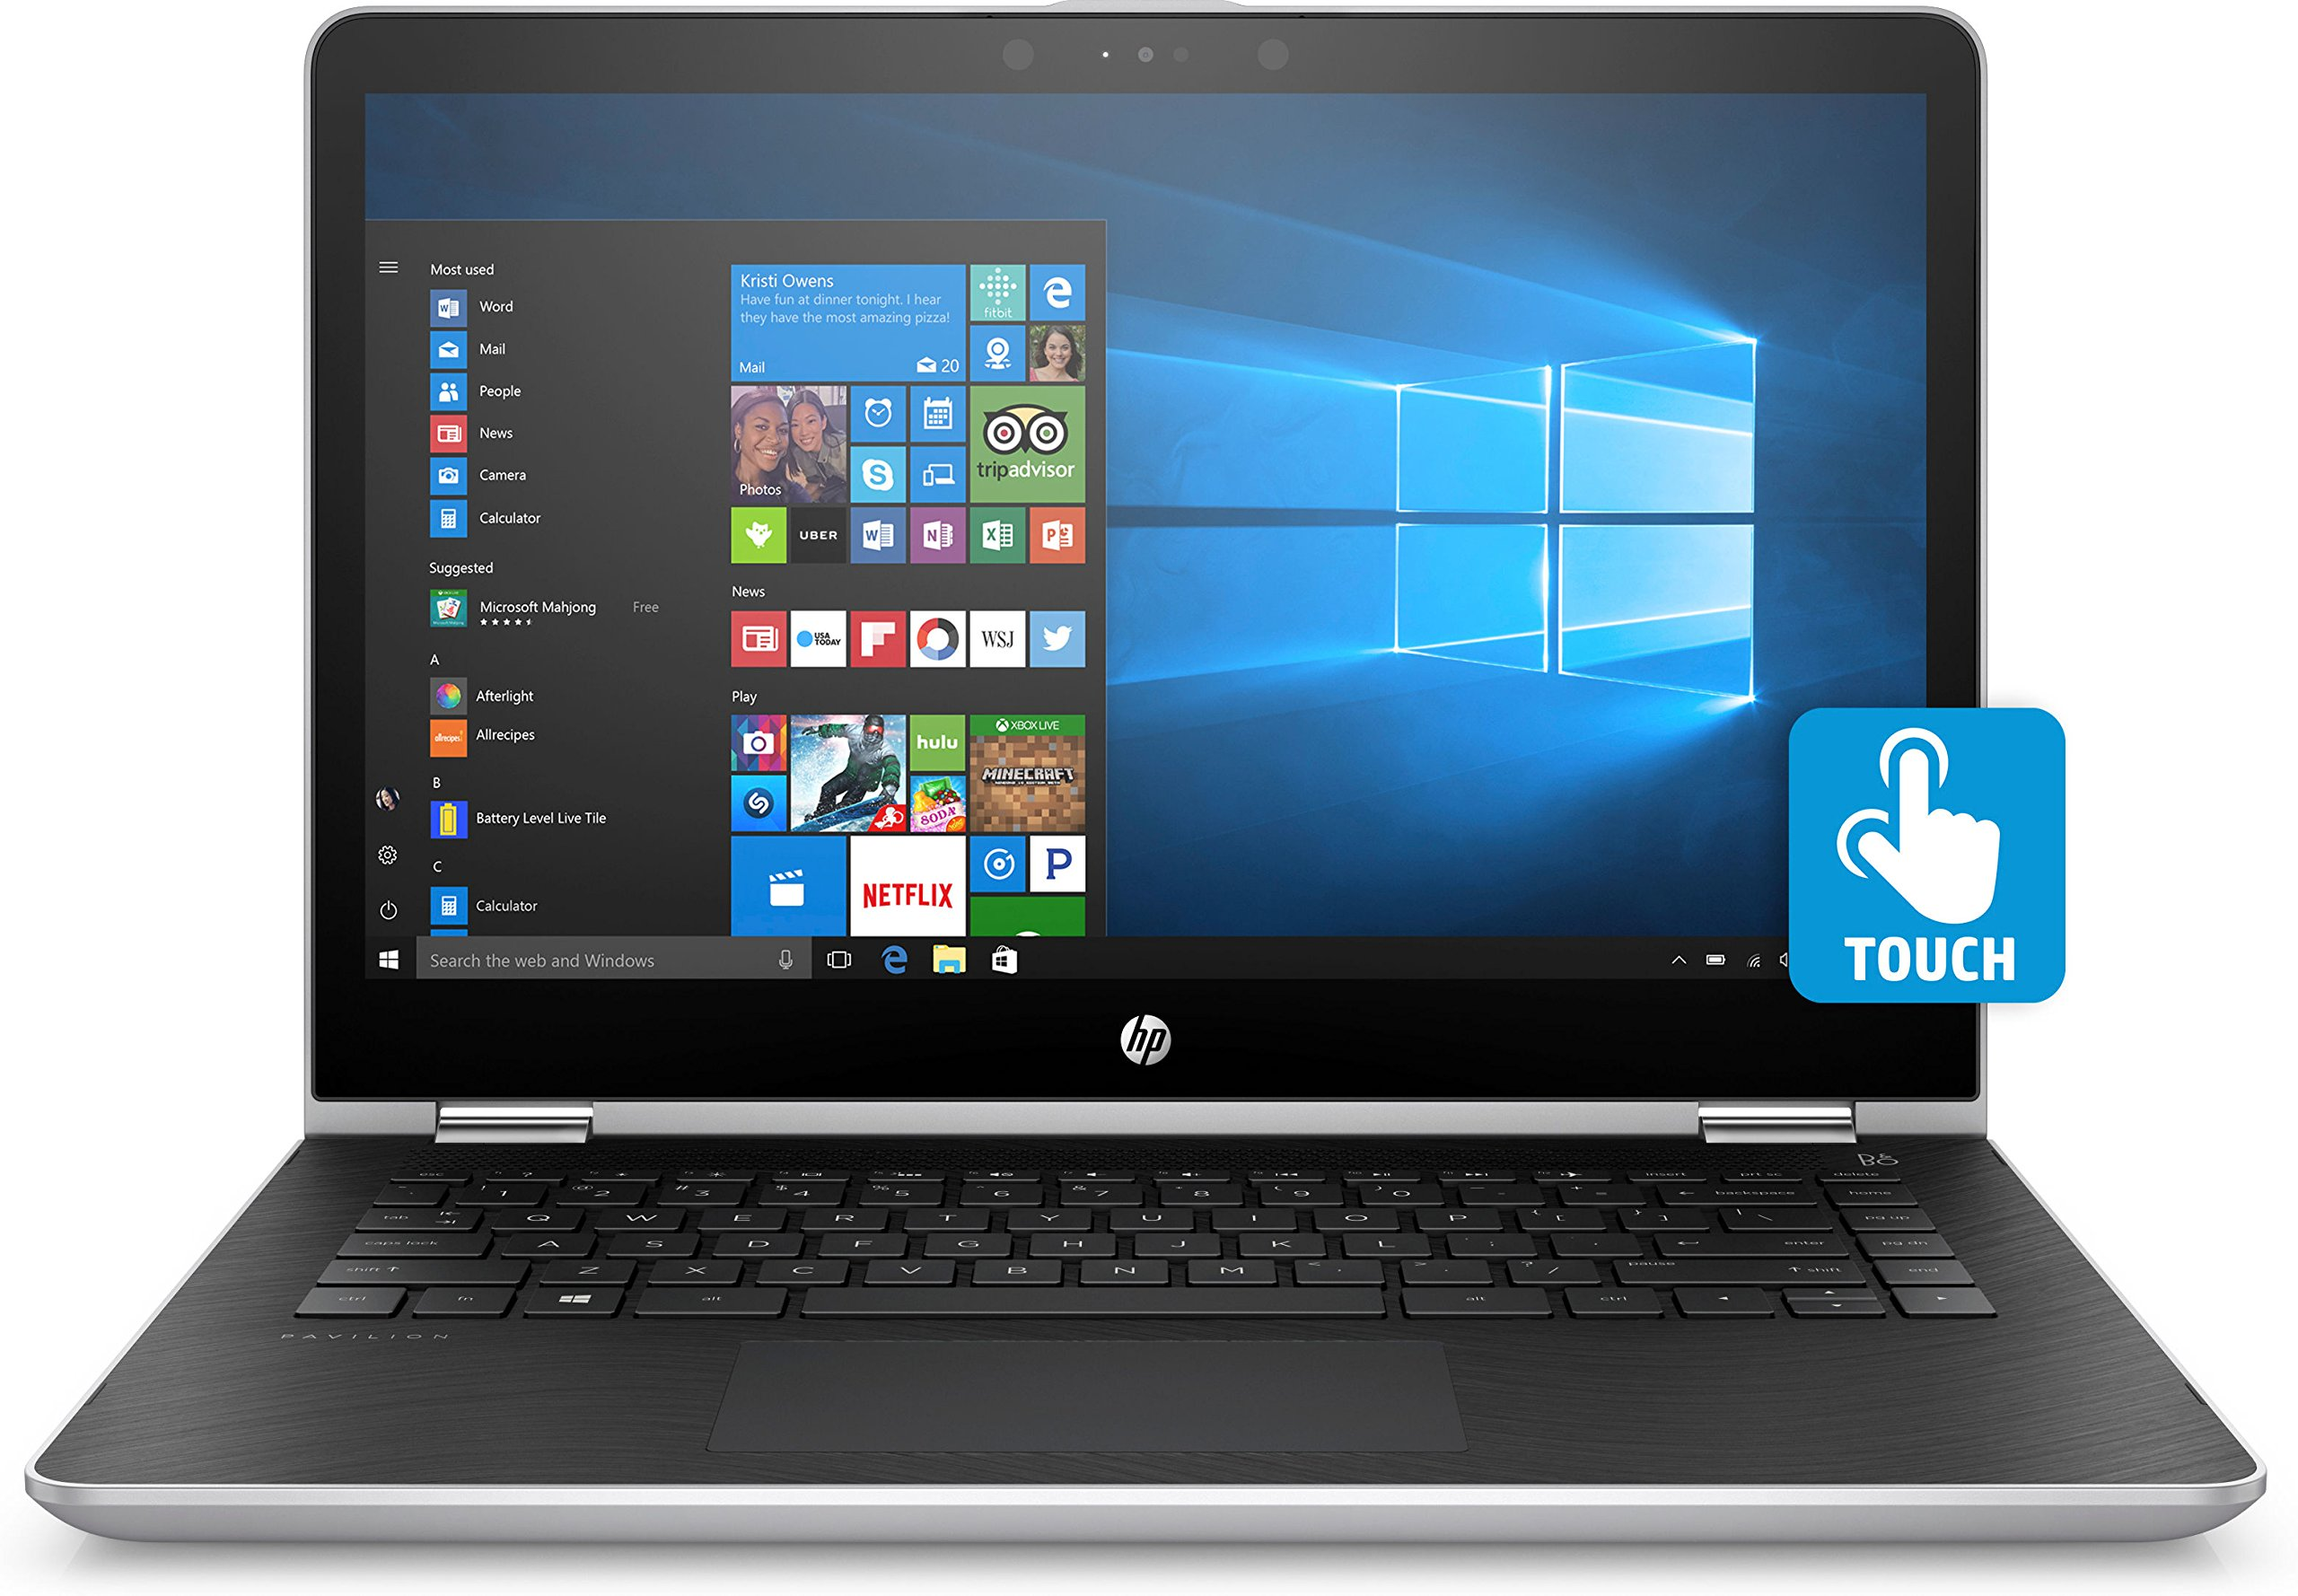 Hp Pavillion X360 14 Ba051sa 14 Inch Full Hd Convertible Laptop Intel I3 7100u 128gb Ssd 4gb Ram Windows 10 Silver Buy Online In Bahamas Pavillionintelintel Products